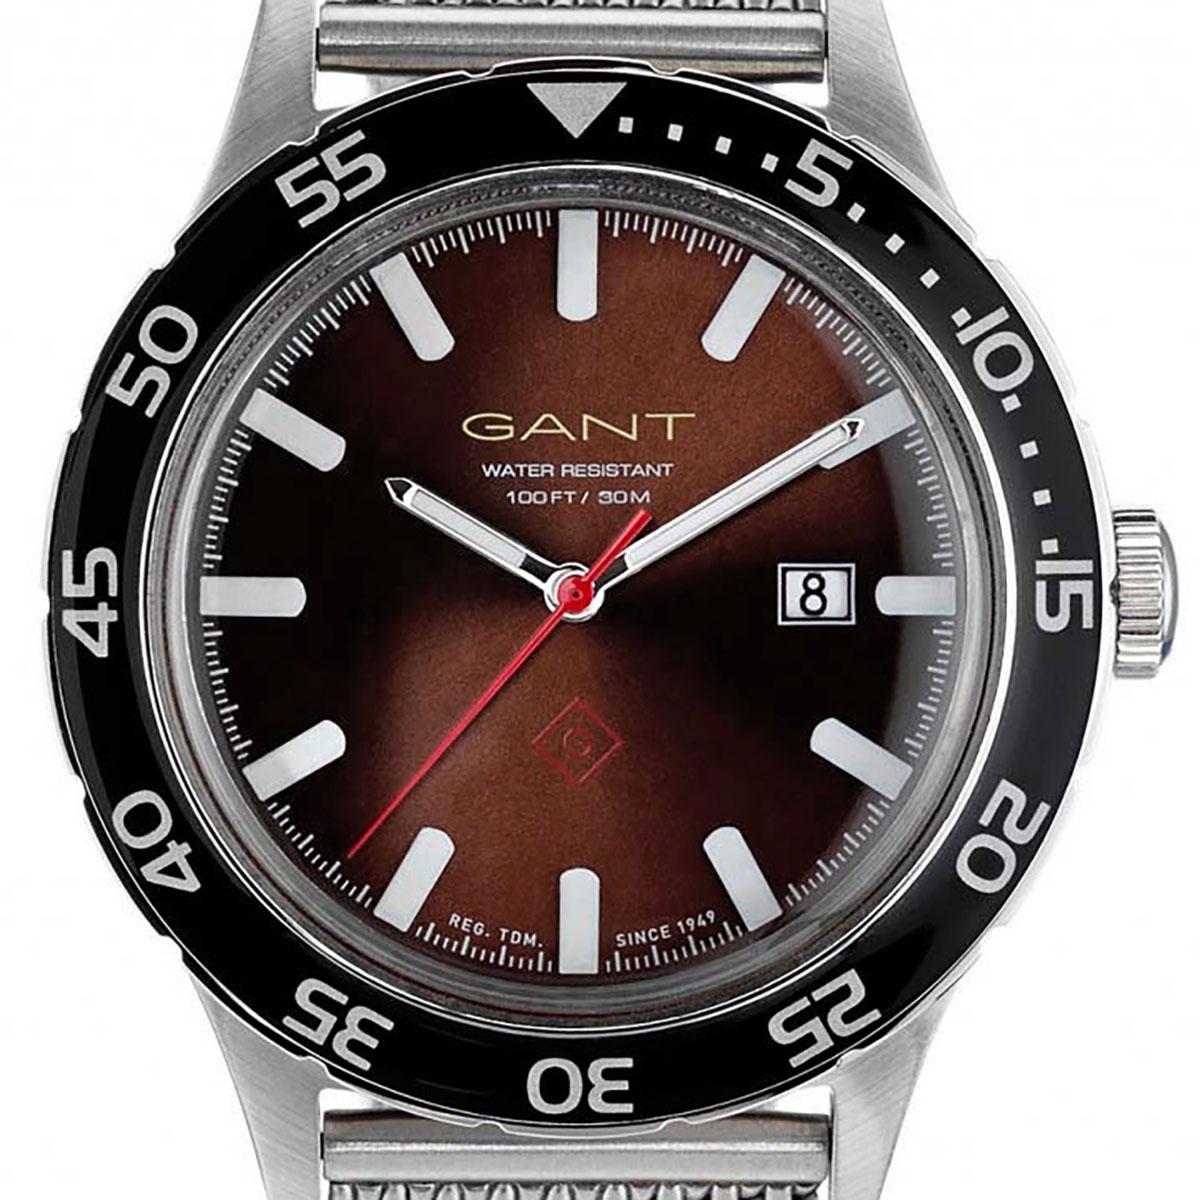 GANT ガント 電池式クォーツ 腕時計 [W70452] 並行輸入品 ブラウン(茶)